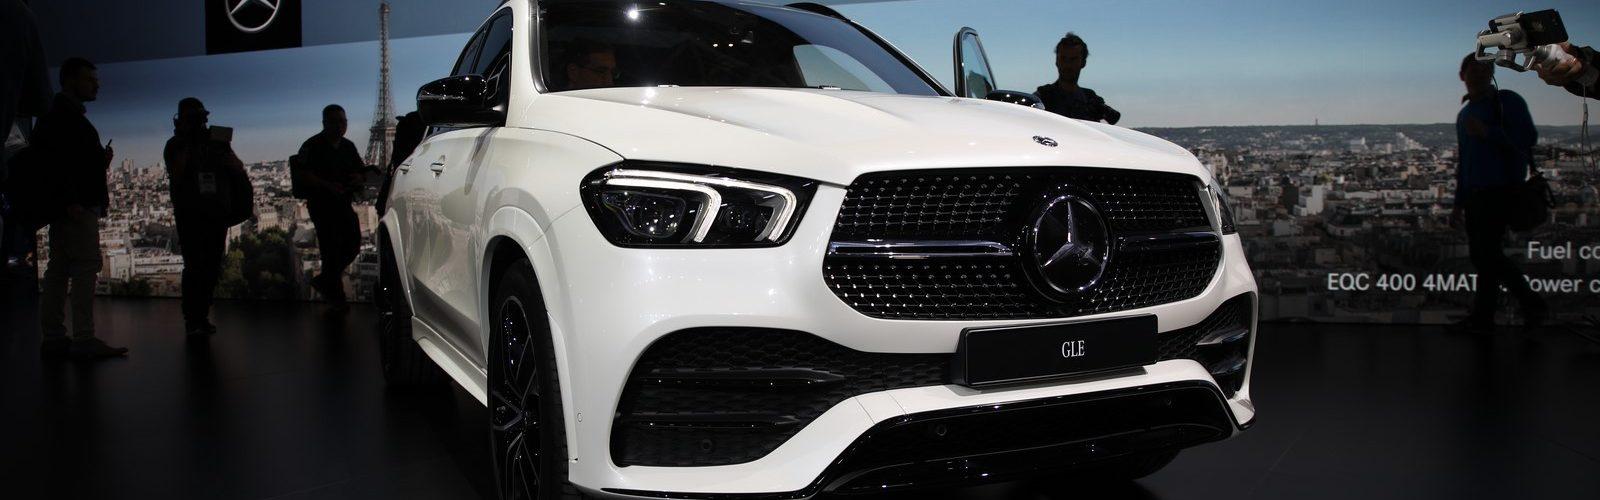 Mondial Paris 2018 Mercedes GLE 4